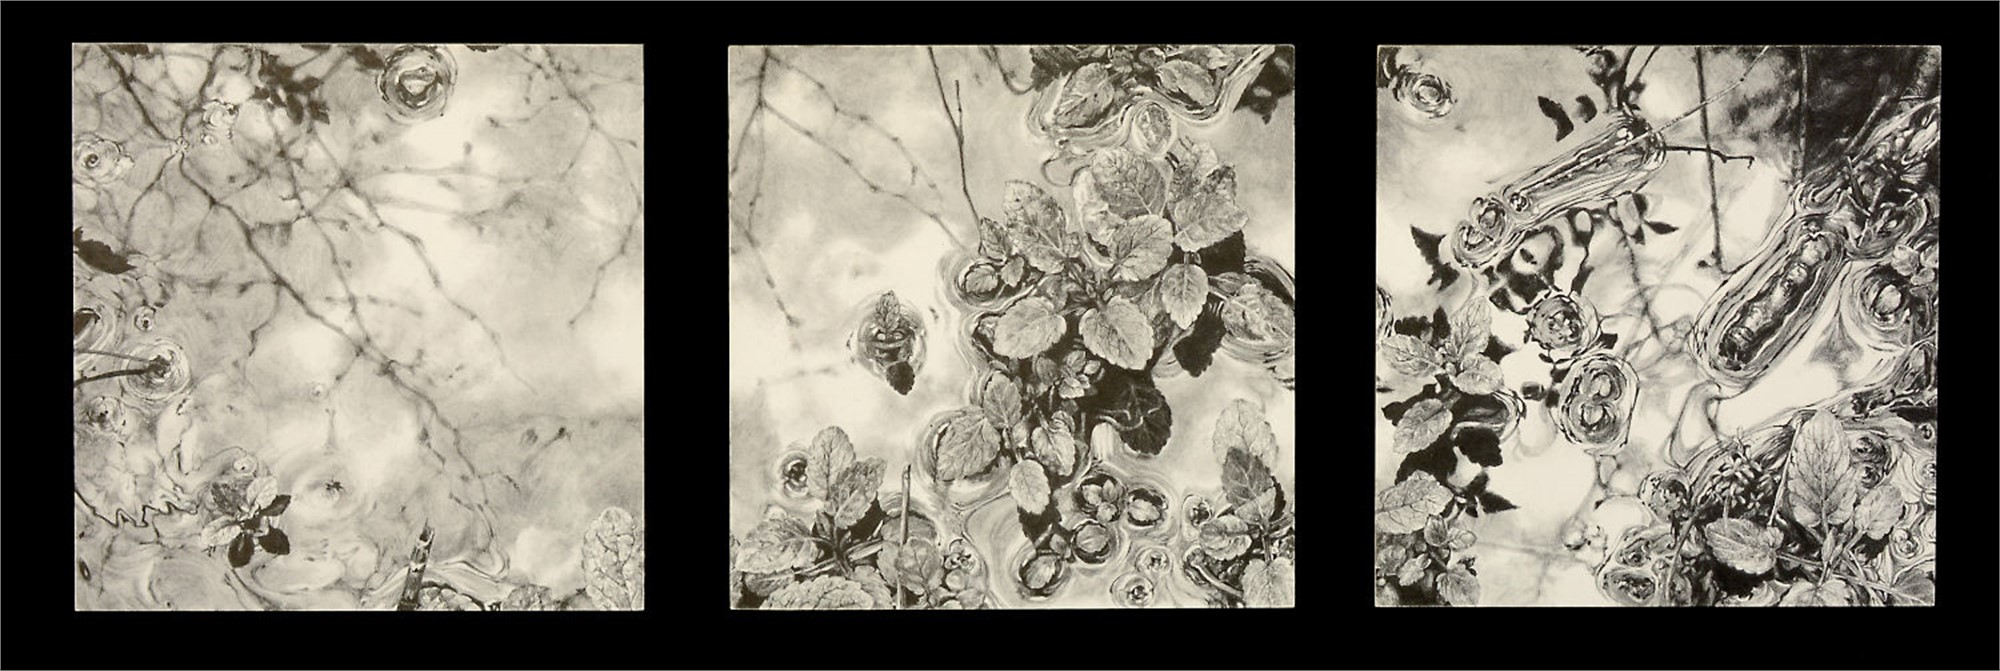 Microcosm (triptych) by Robin Cole